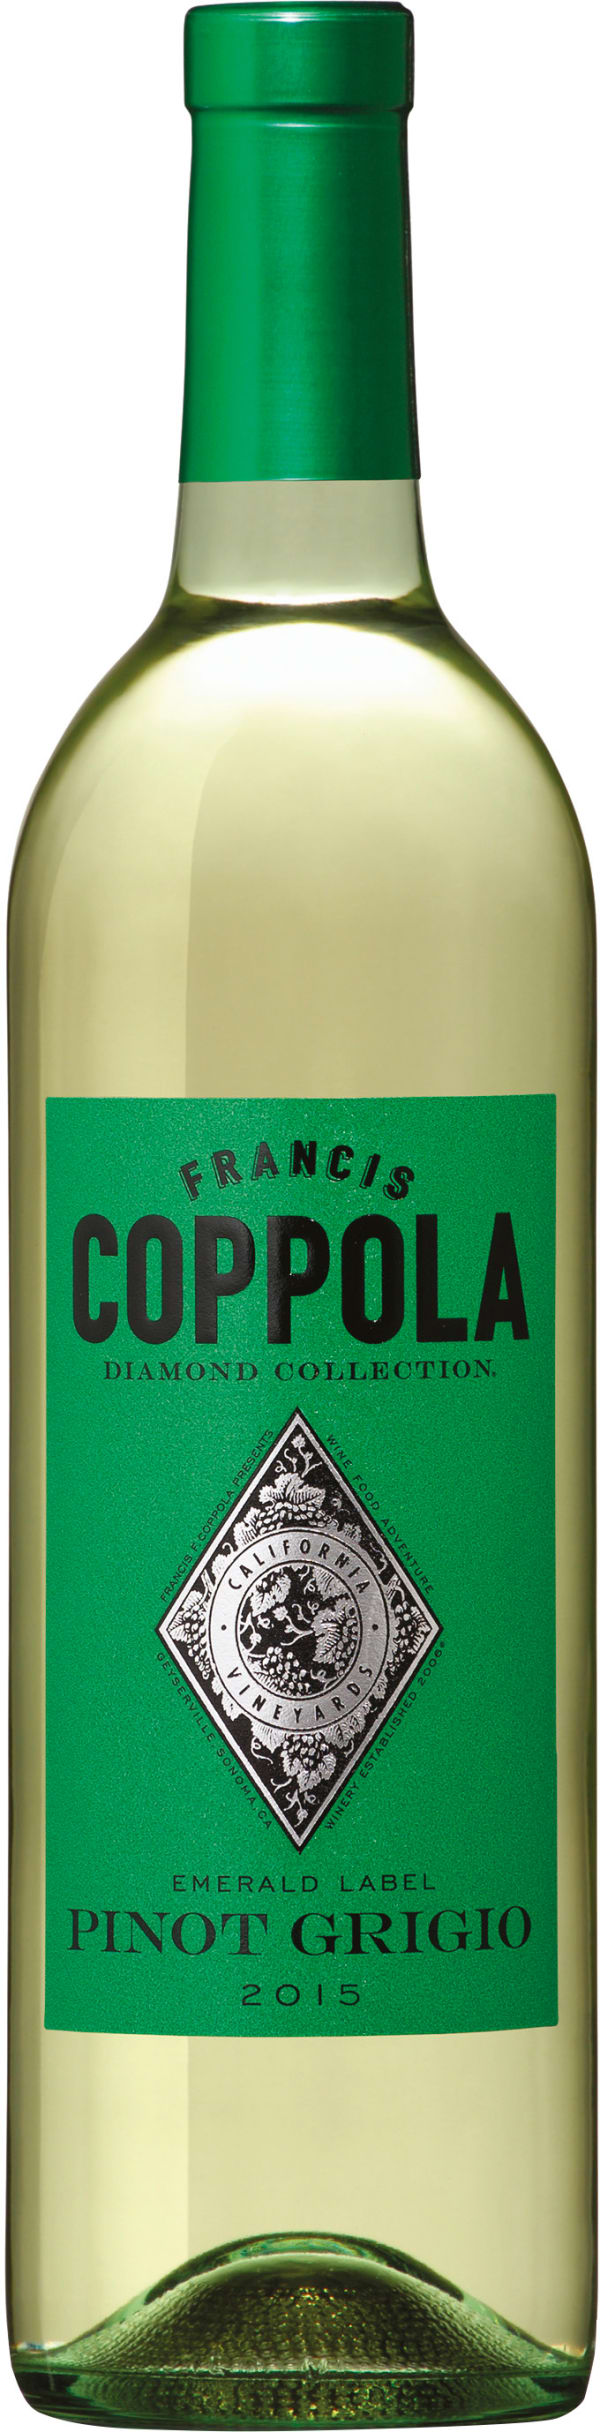 Coppola Diamond Collection Pinot Grigio 2016